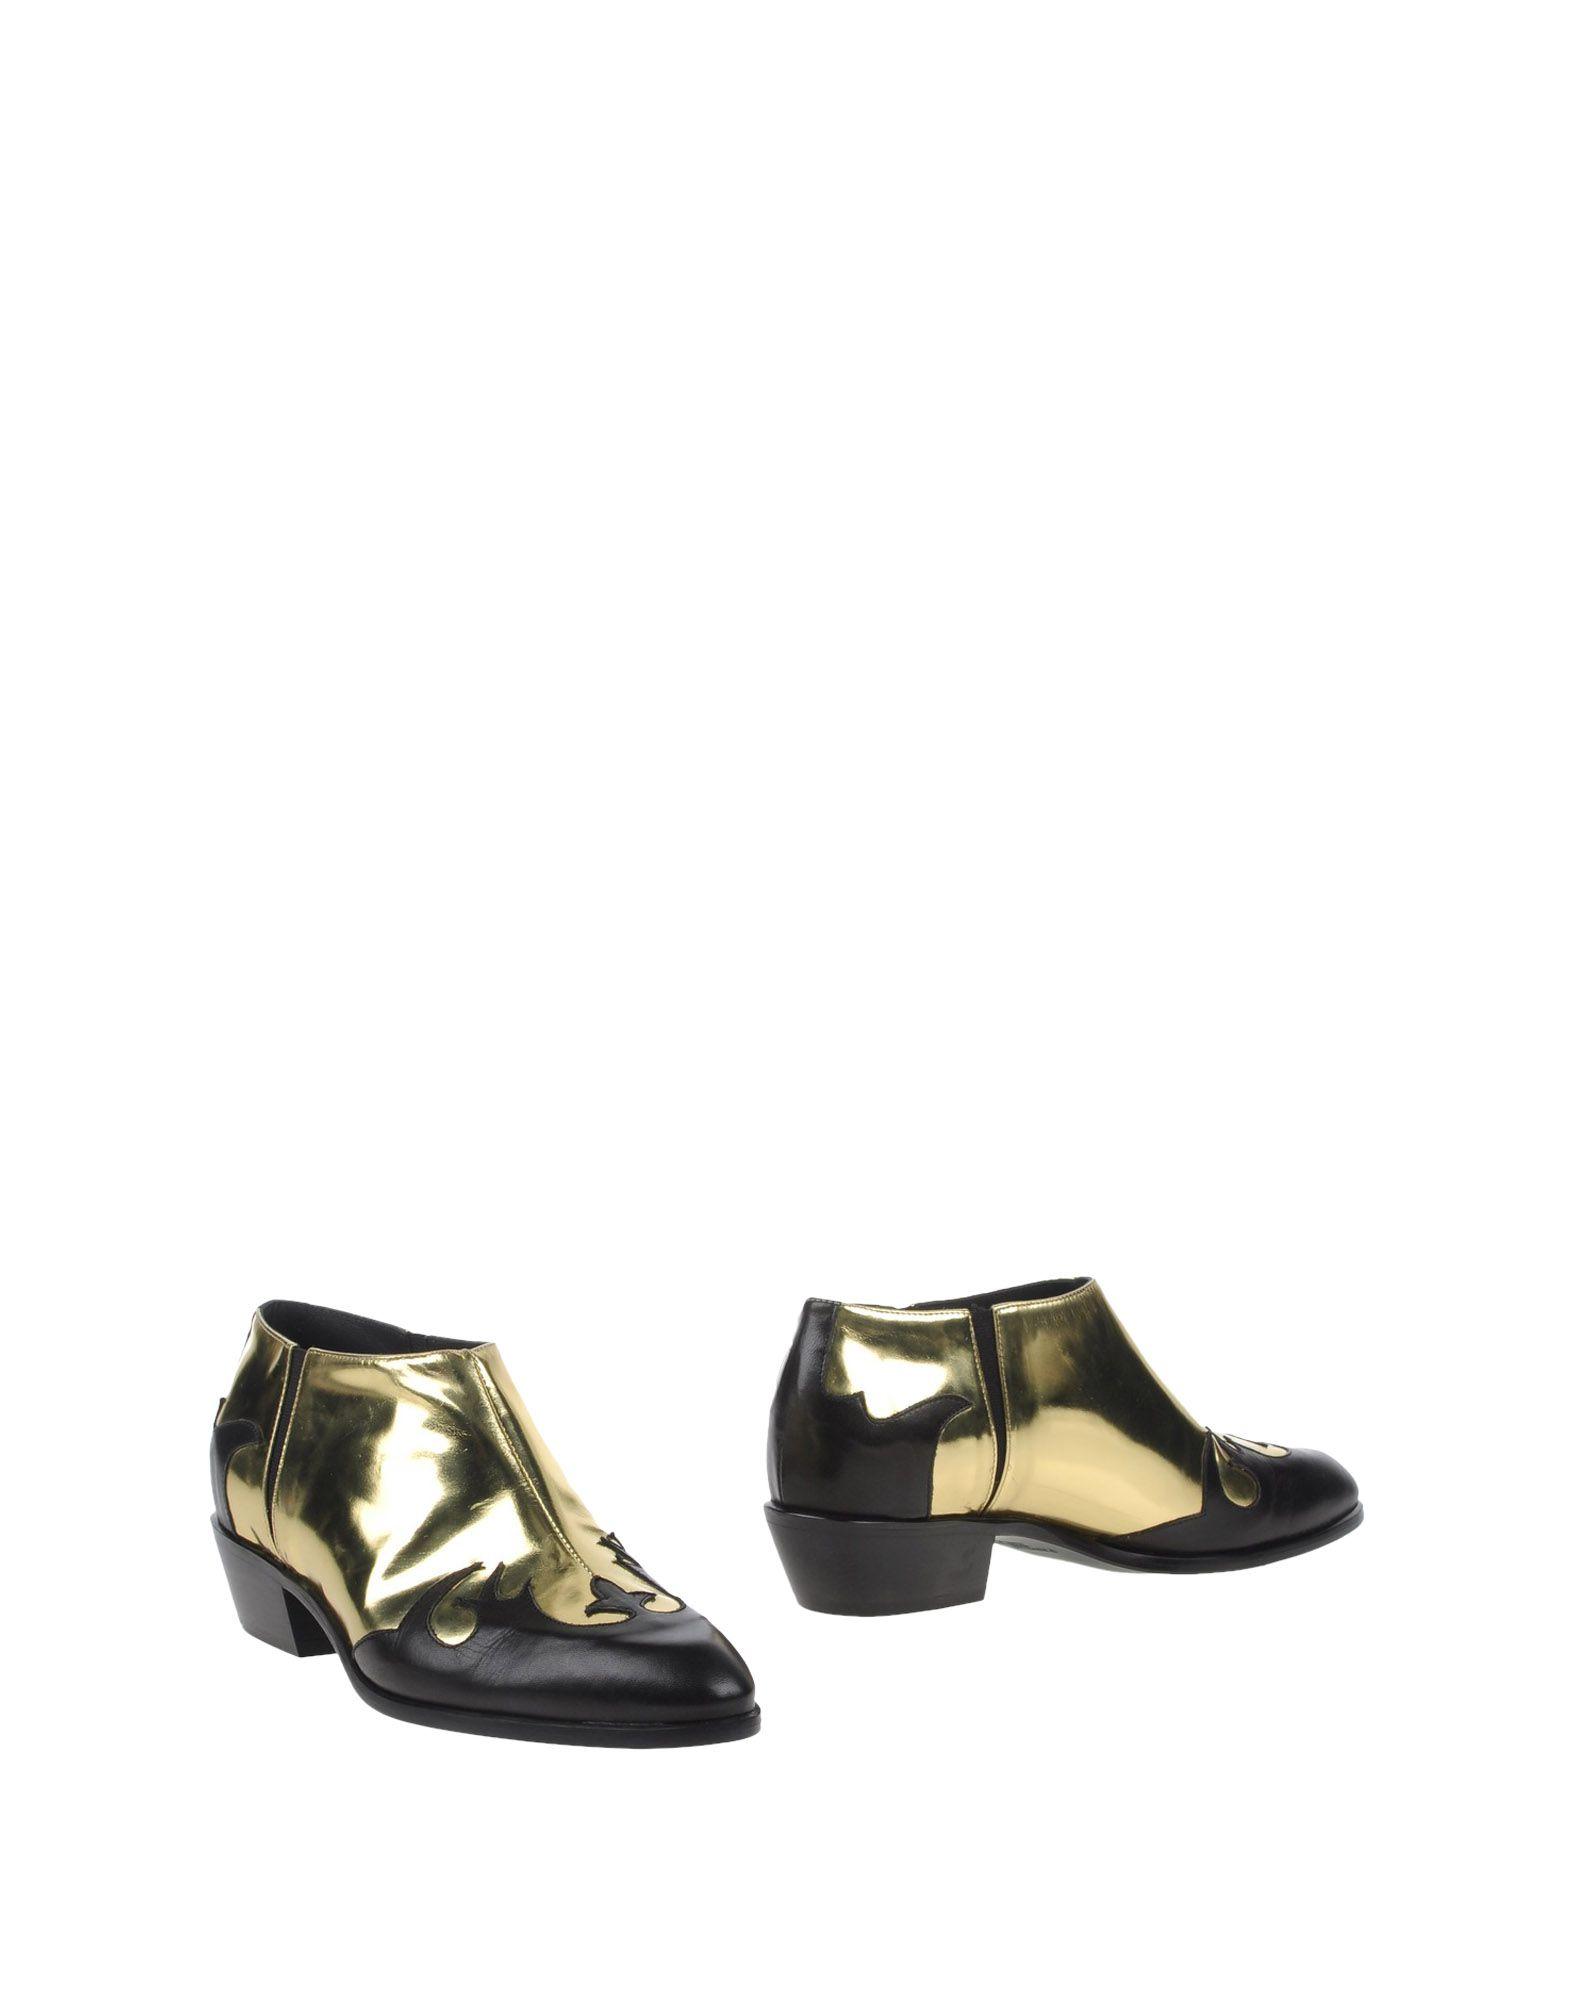 Stilvolle Stiefelette billige Schuhe Patrizia Pepe Stiefelette Stilvolle Damen  44996652CO 45eb3d